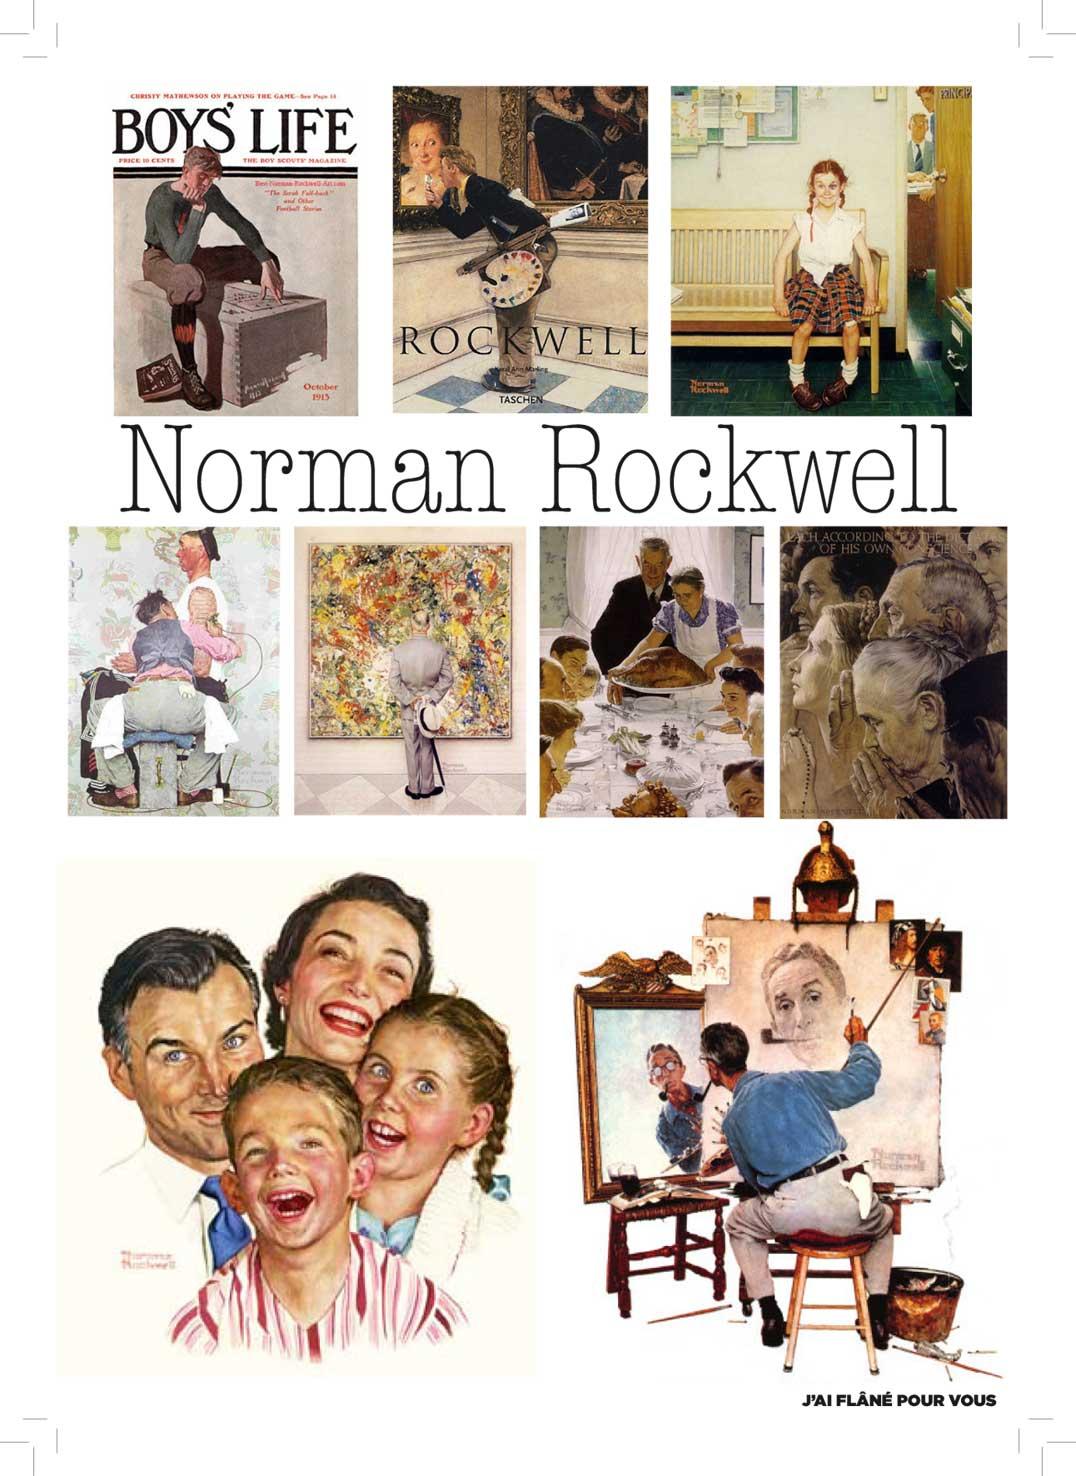 http://2.bp.blogspot.com/_txuBTB2__fE/SOkhd2dLfBI/AAAAAAAAGDM/6o_W7JXZzxs/s1600/Norman-Rockwell.jpg